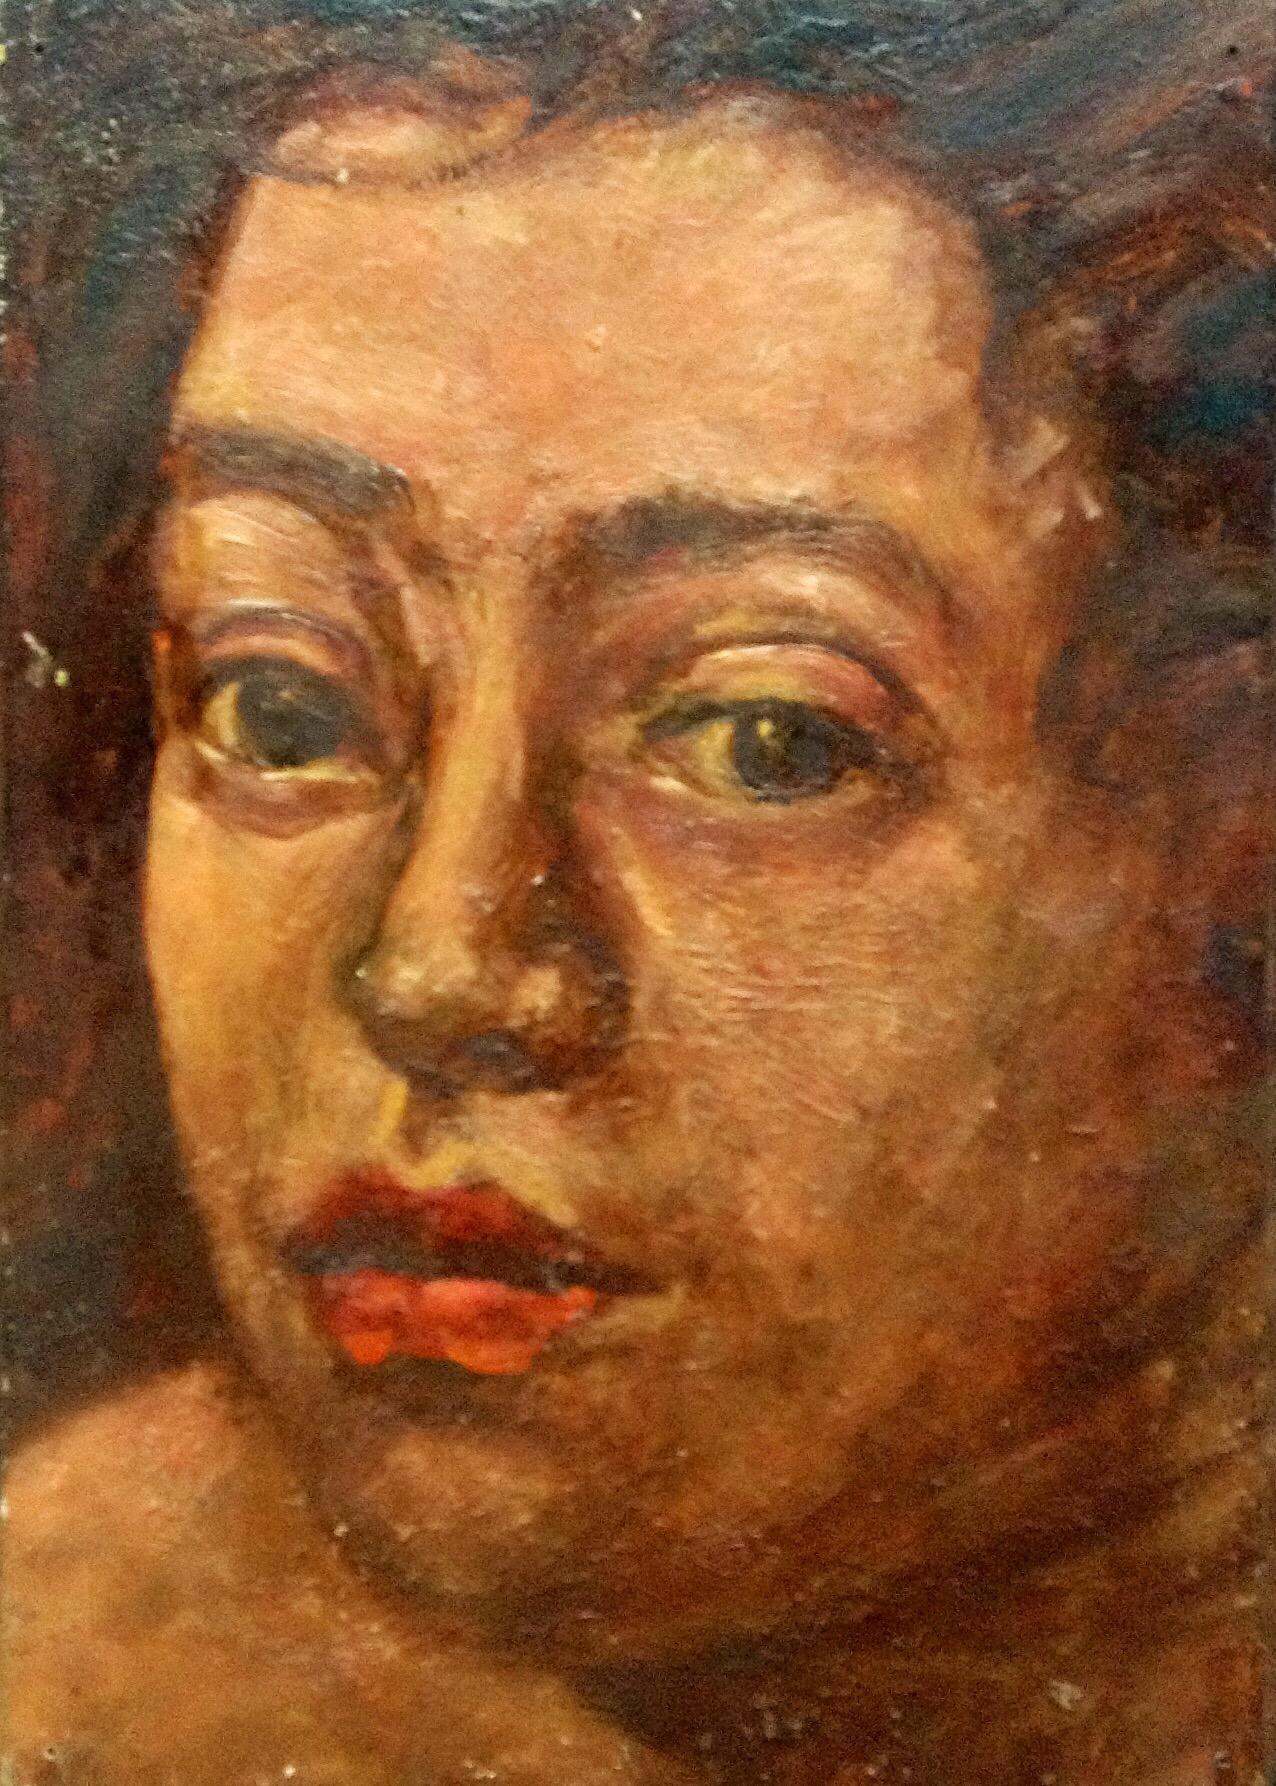 "Study for Bertha, oil on wood panel, 11"" x 9"""